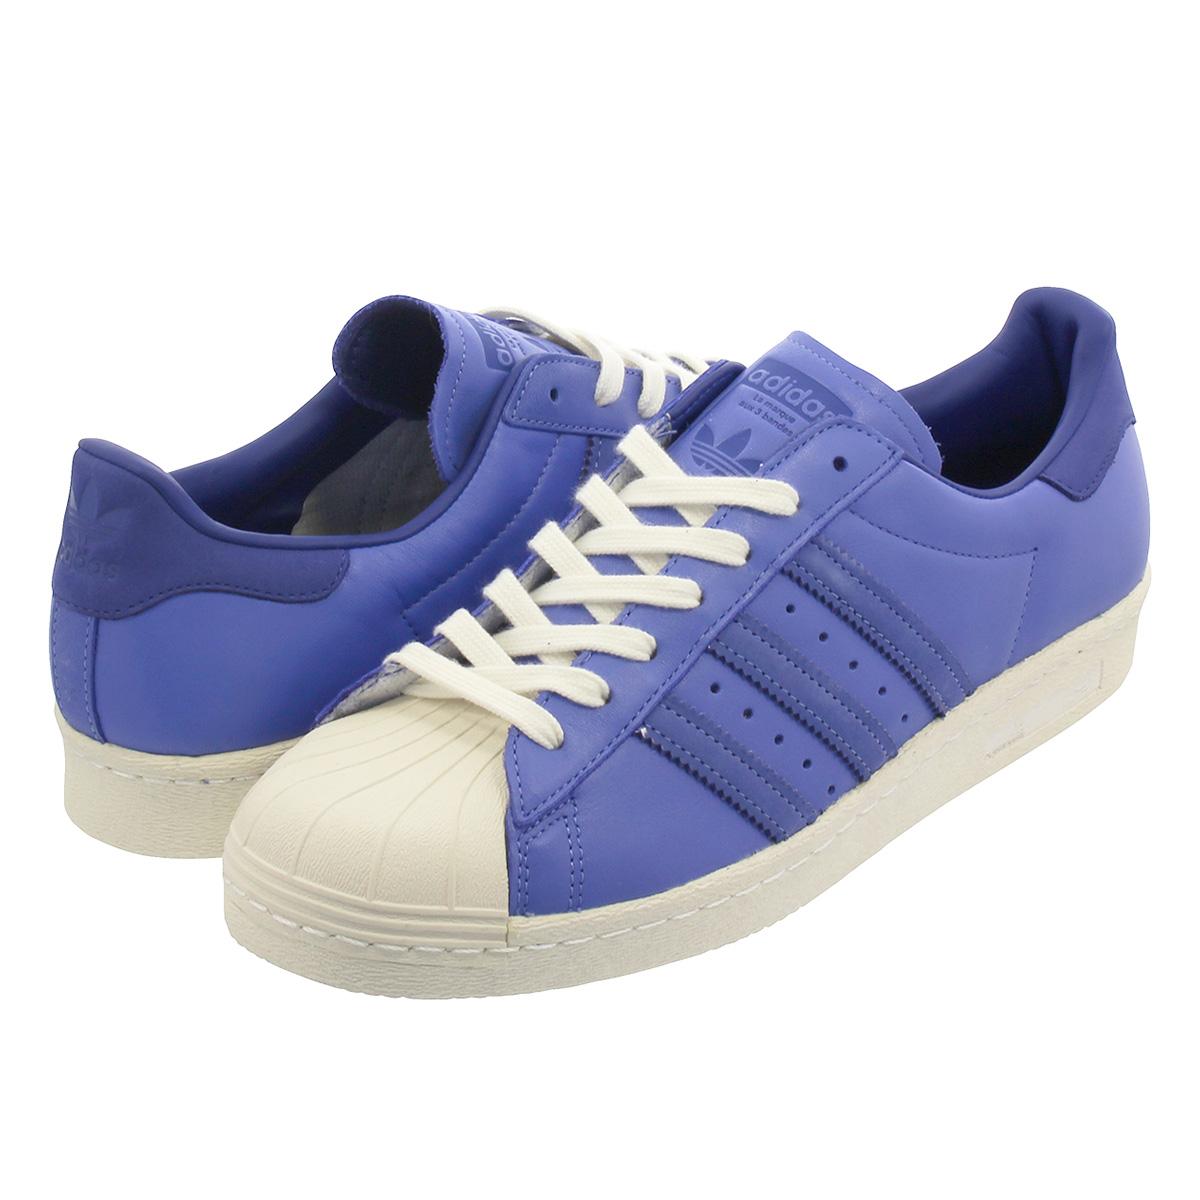 photos officielles e4770 2c590 adidas SUPERSTAR 80s Adidas superstar 80s REAL LILAC/ACTIVE BLUE/OFF WHITE  bd7367